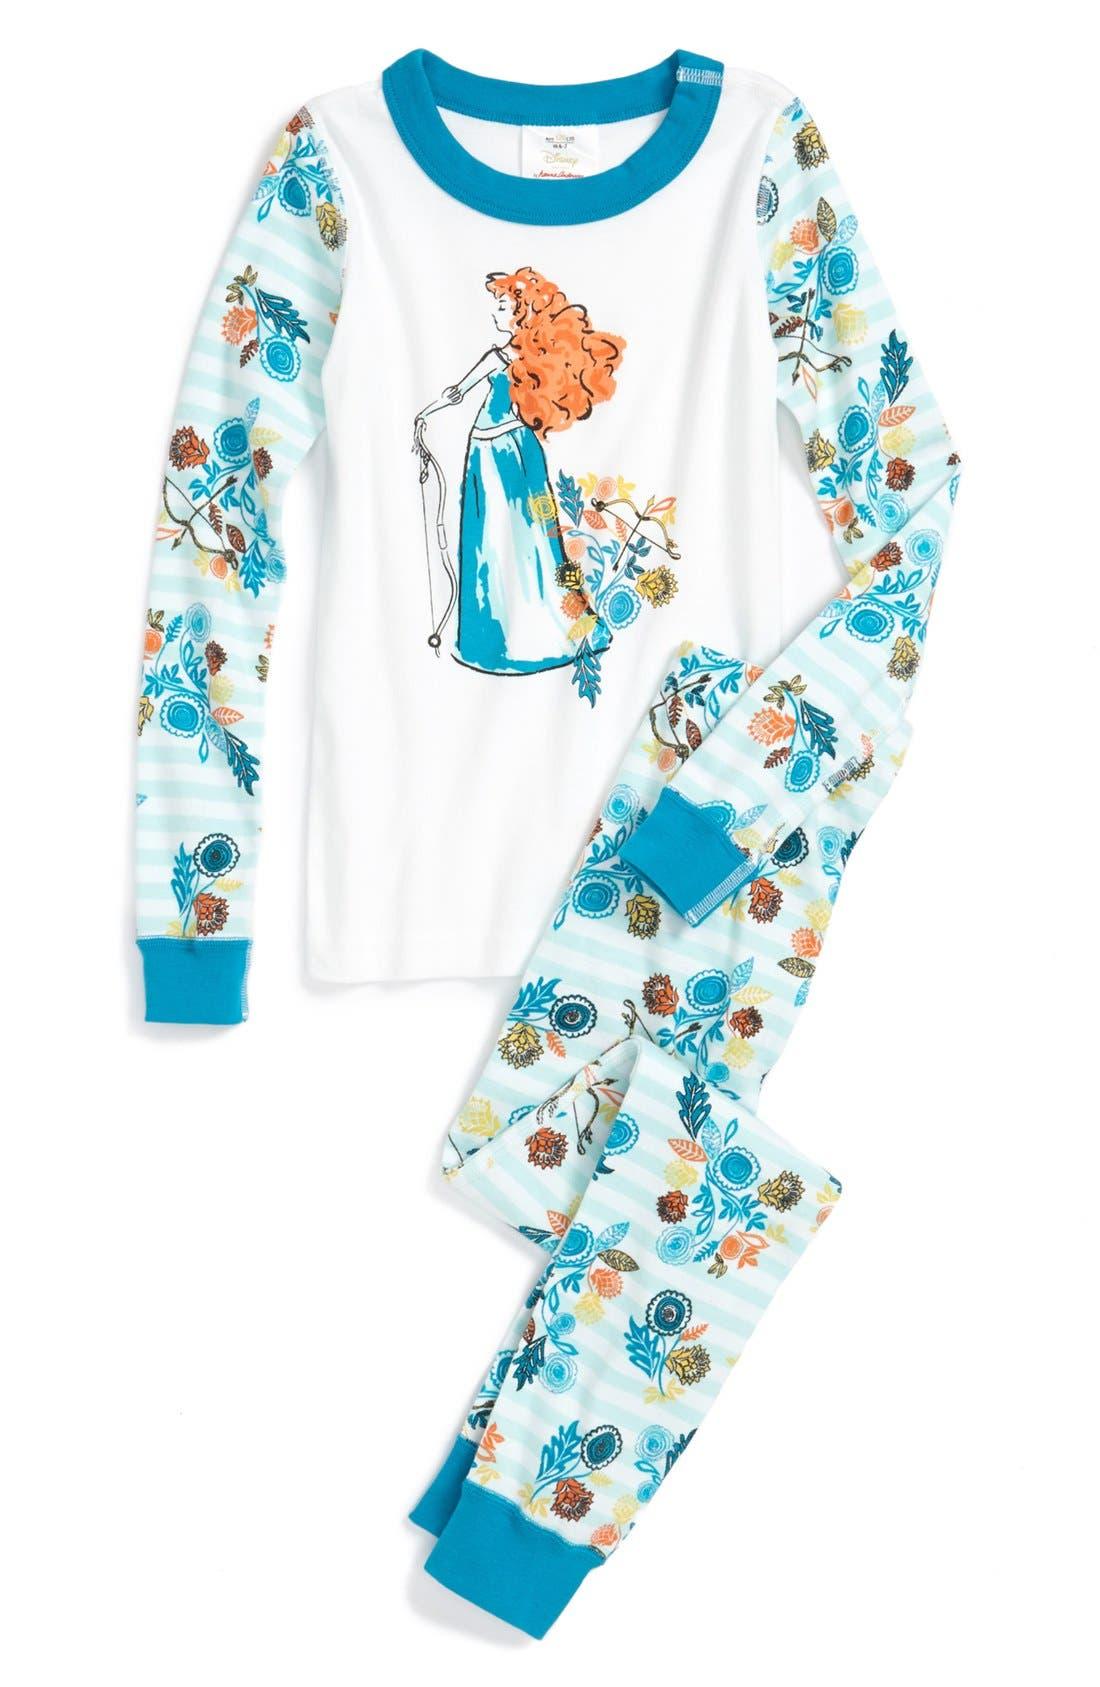 Main Image - Hanna Andersson 'Disney™ Princess - Merida' Two-Piece Fitted Pajamas (Toddler Girls)